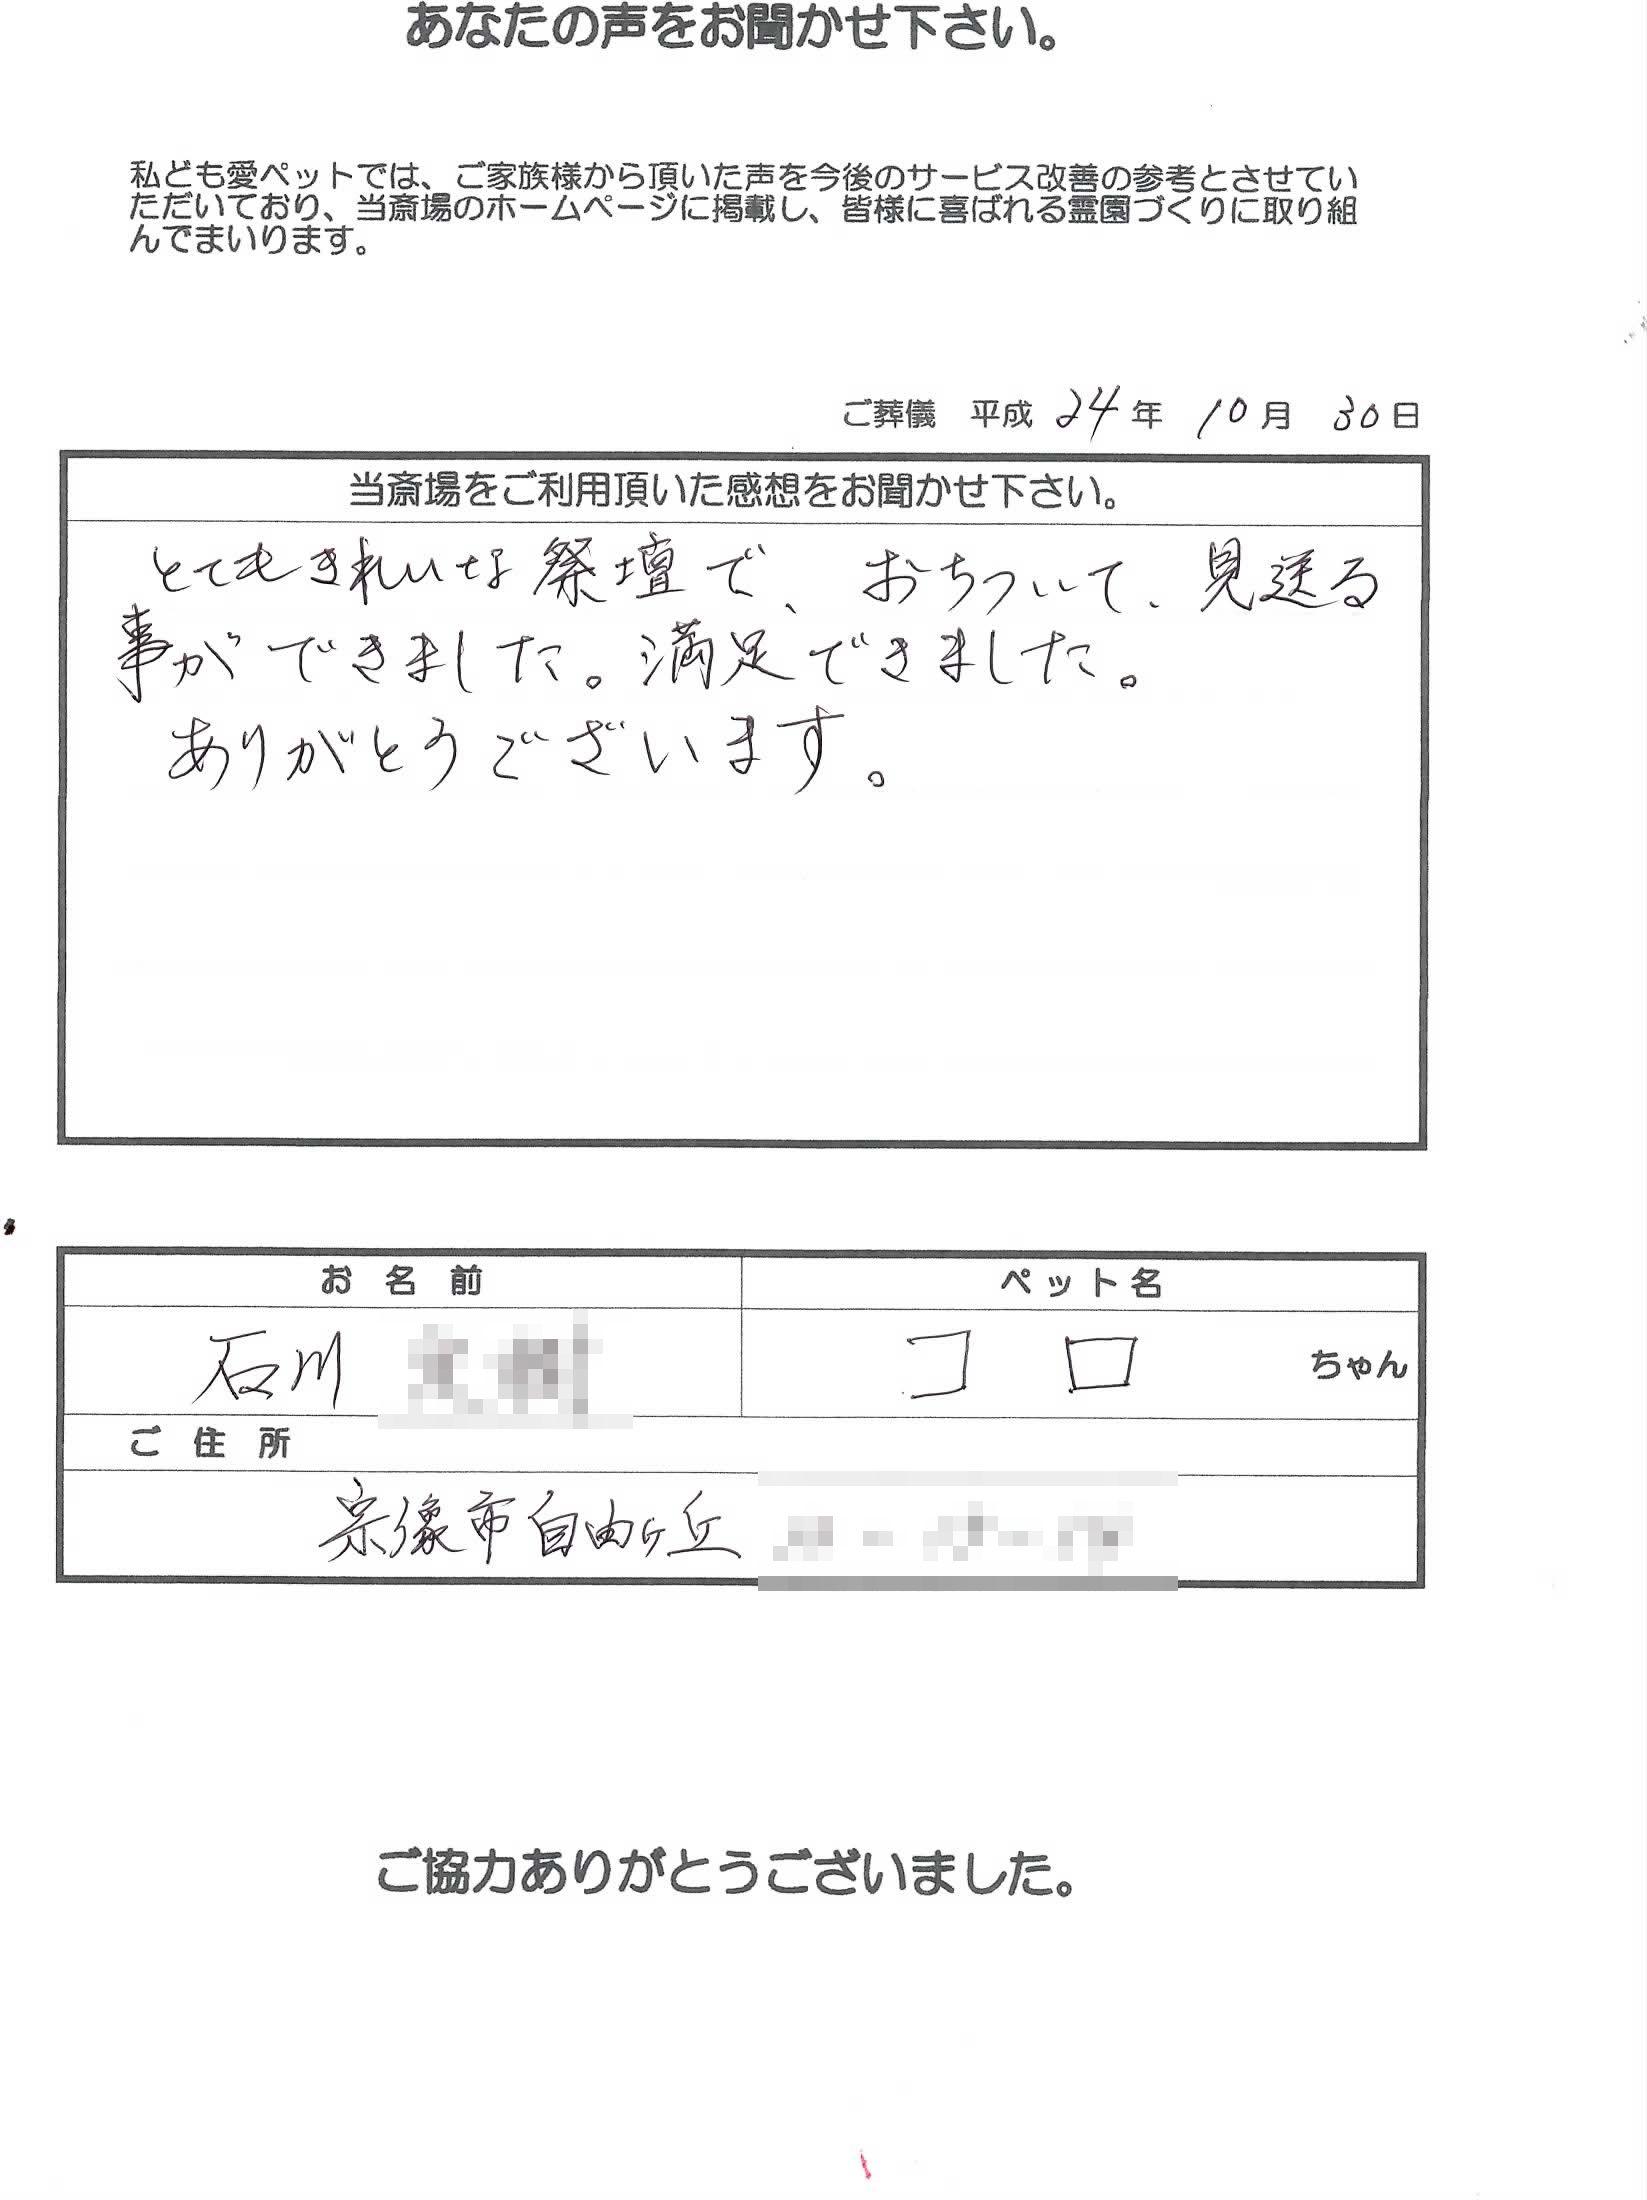 k121030-1.jpg